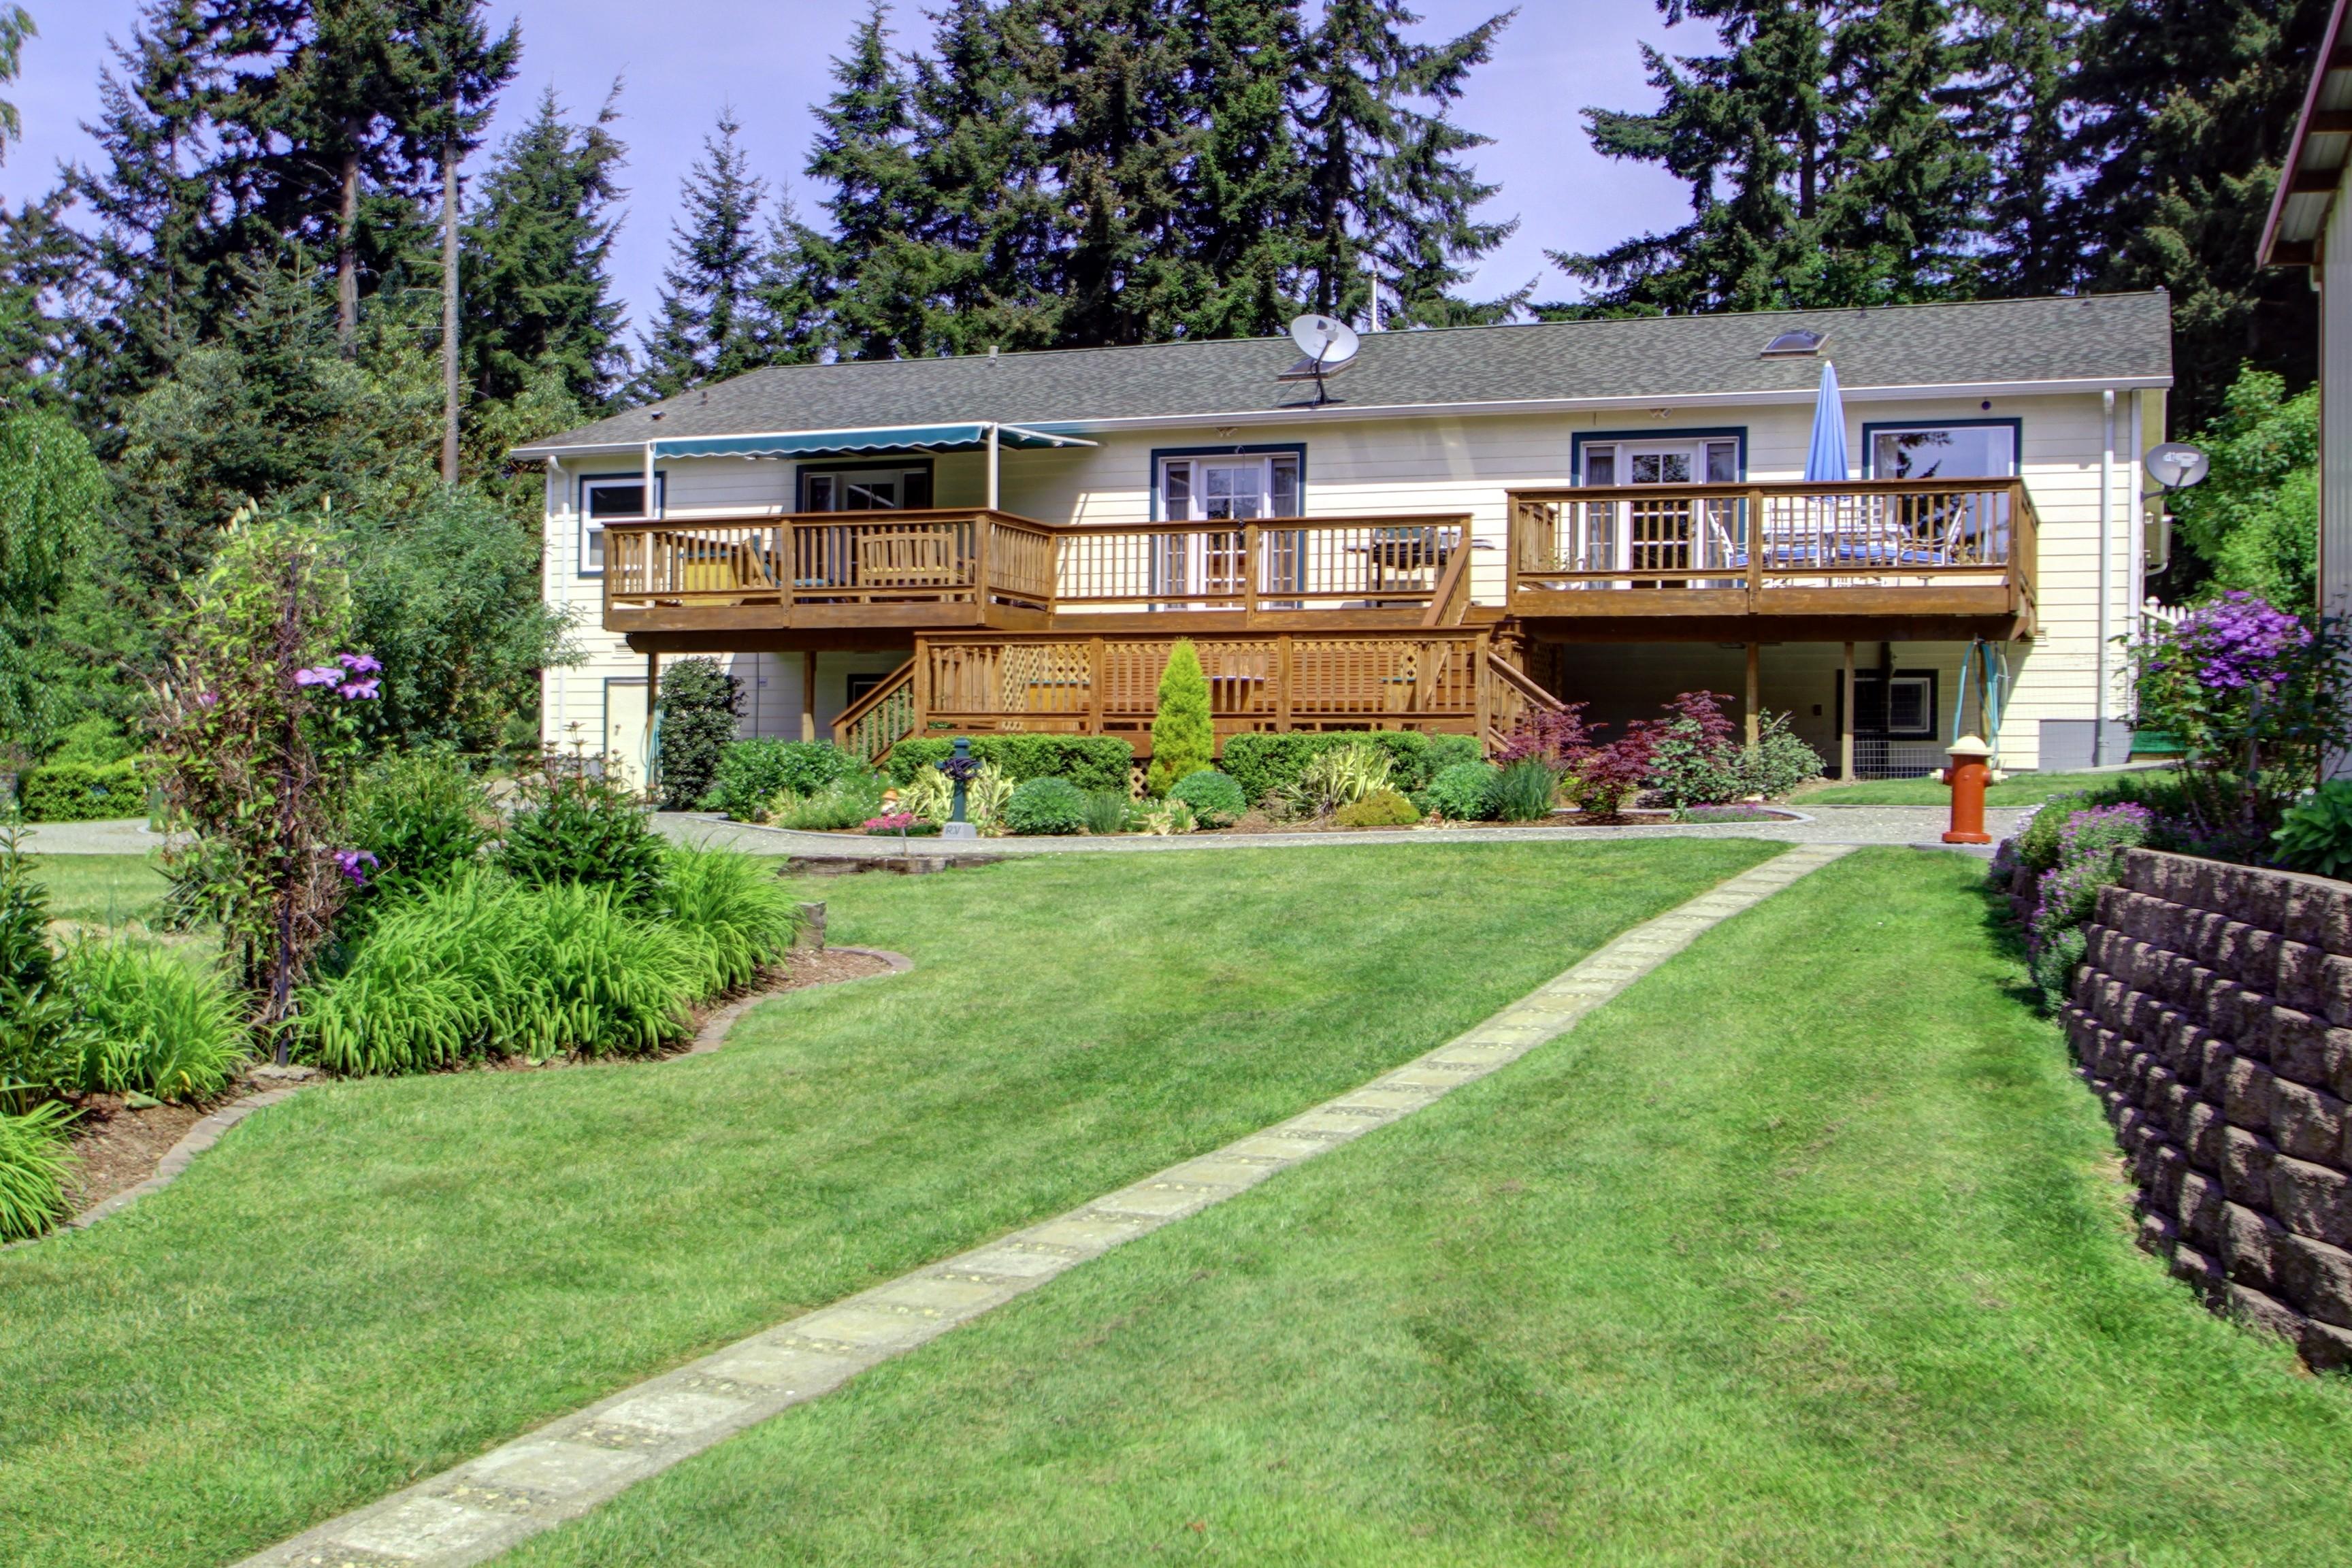 Single Family Home for Sale at 288 Shumway Camano Island, Washington 98282 United States